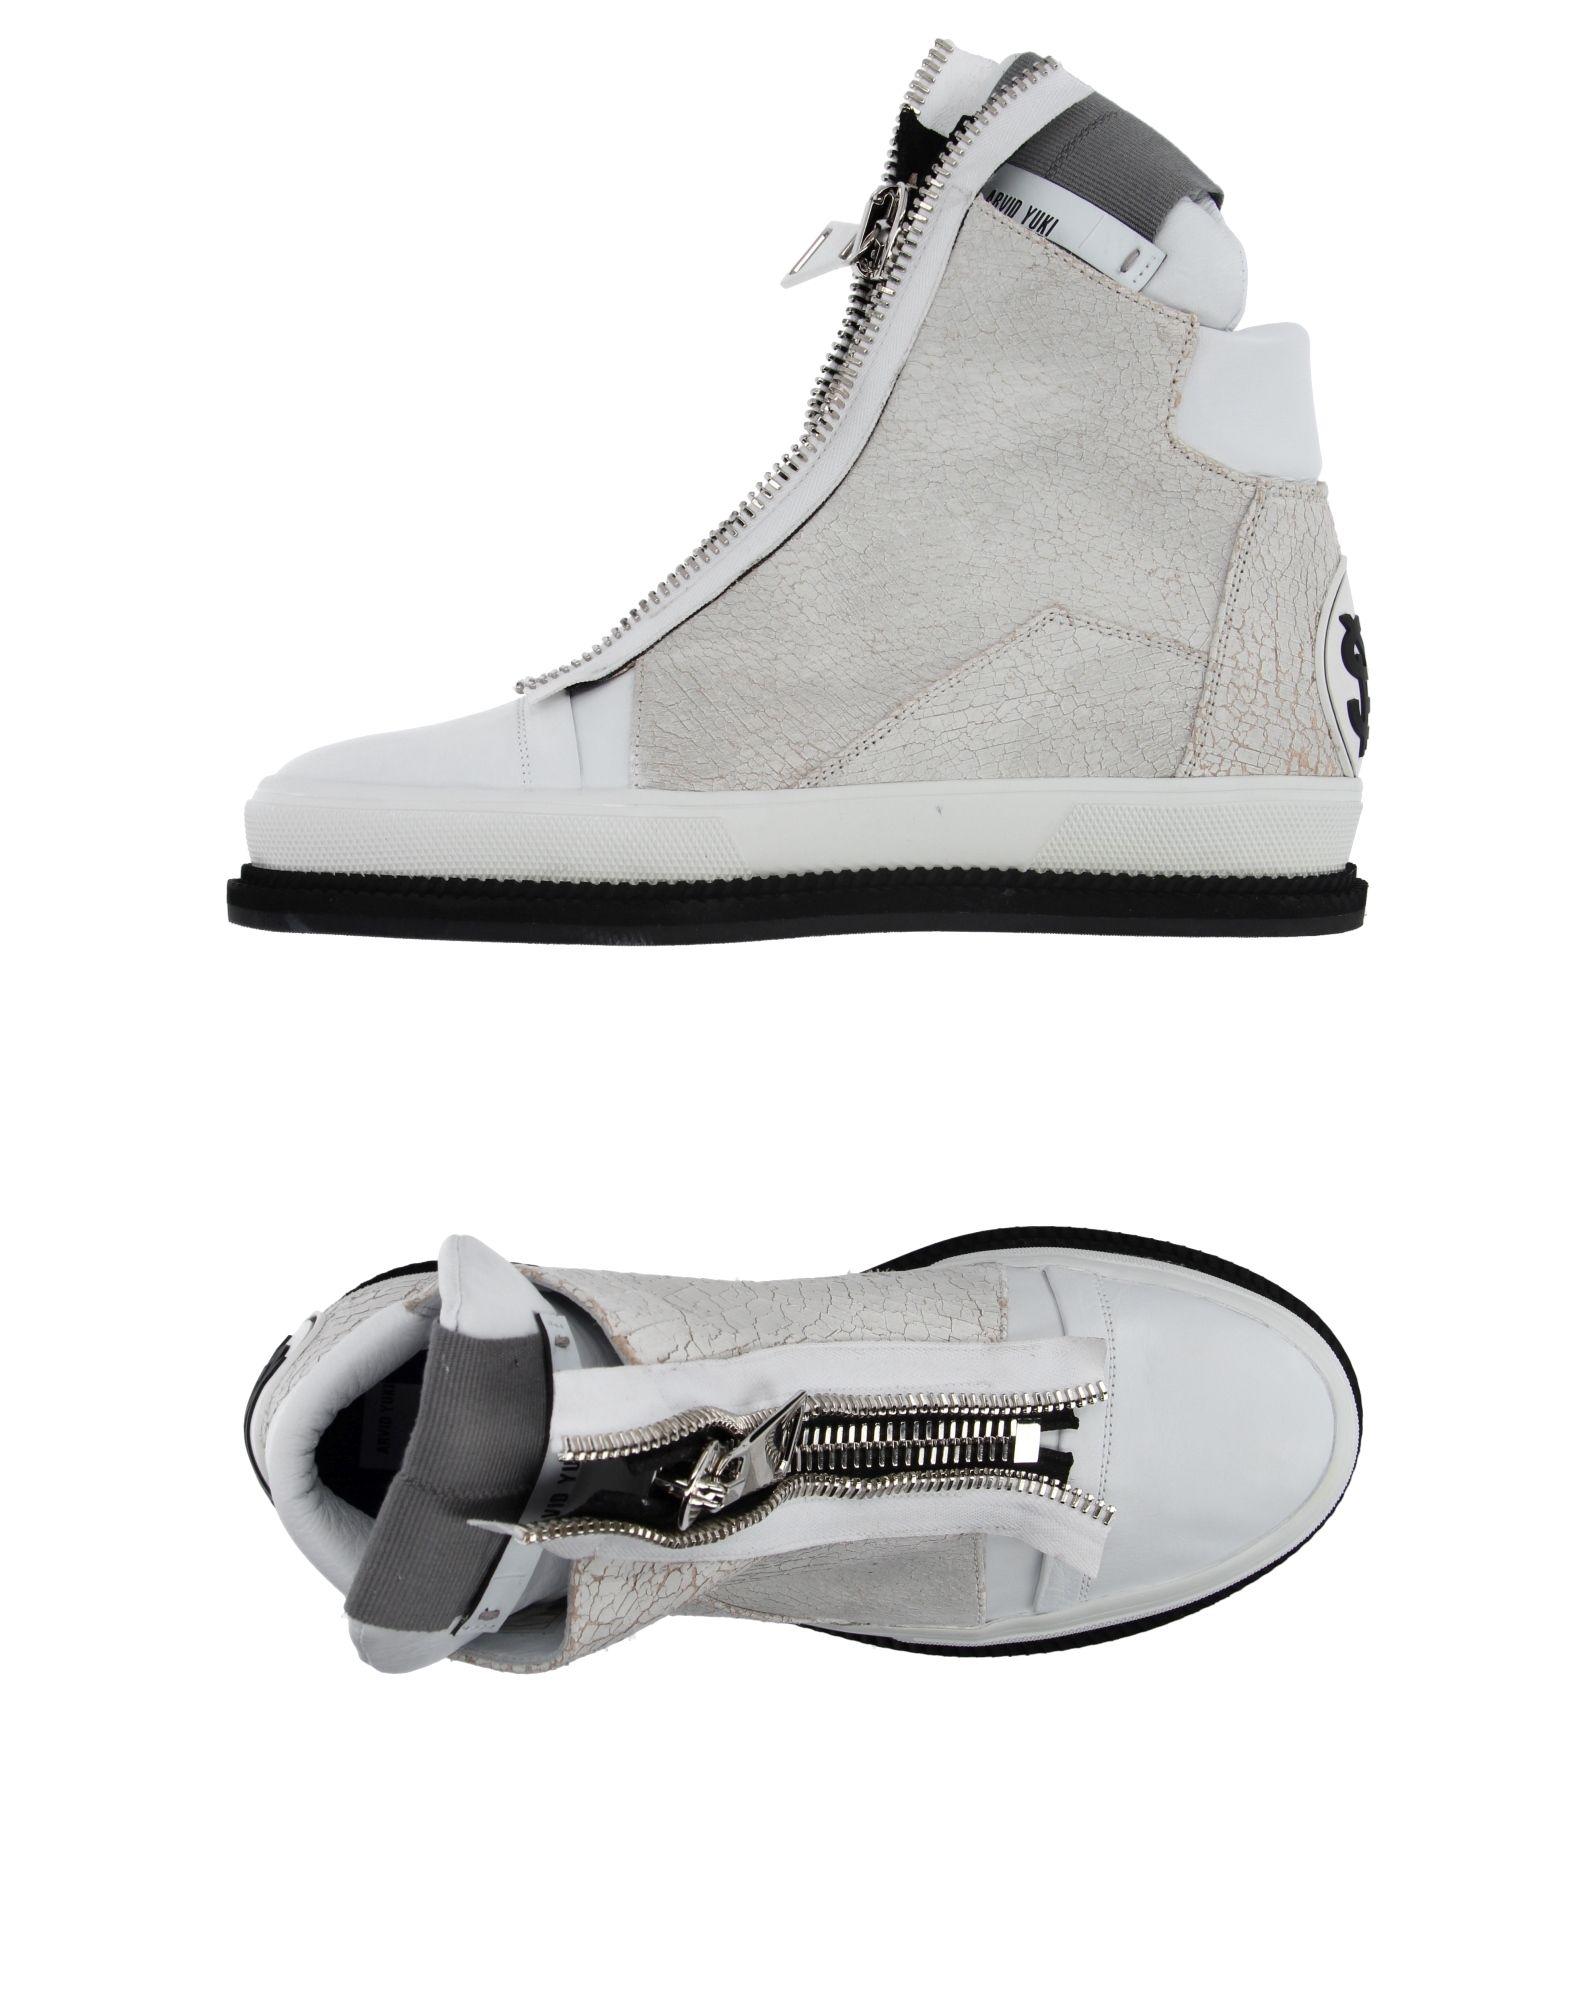 SHY by ARVID YUKI Высокие кеды и кроссовки shy by arvid yuki полусапоги и высокие ботинки